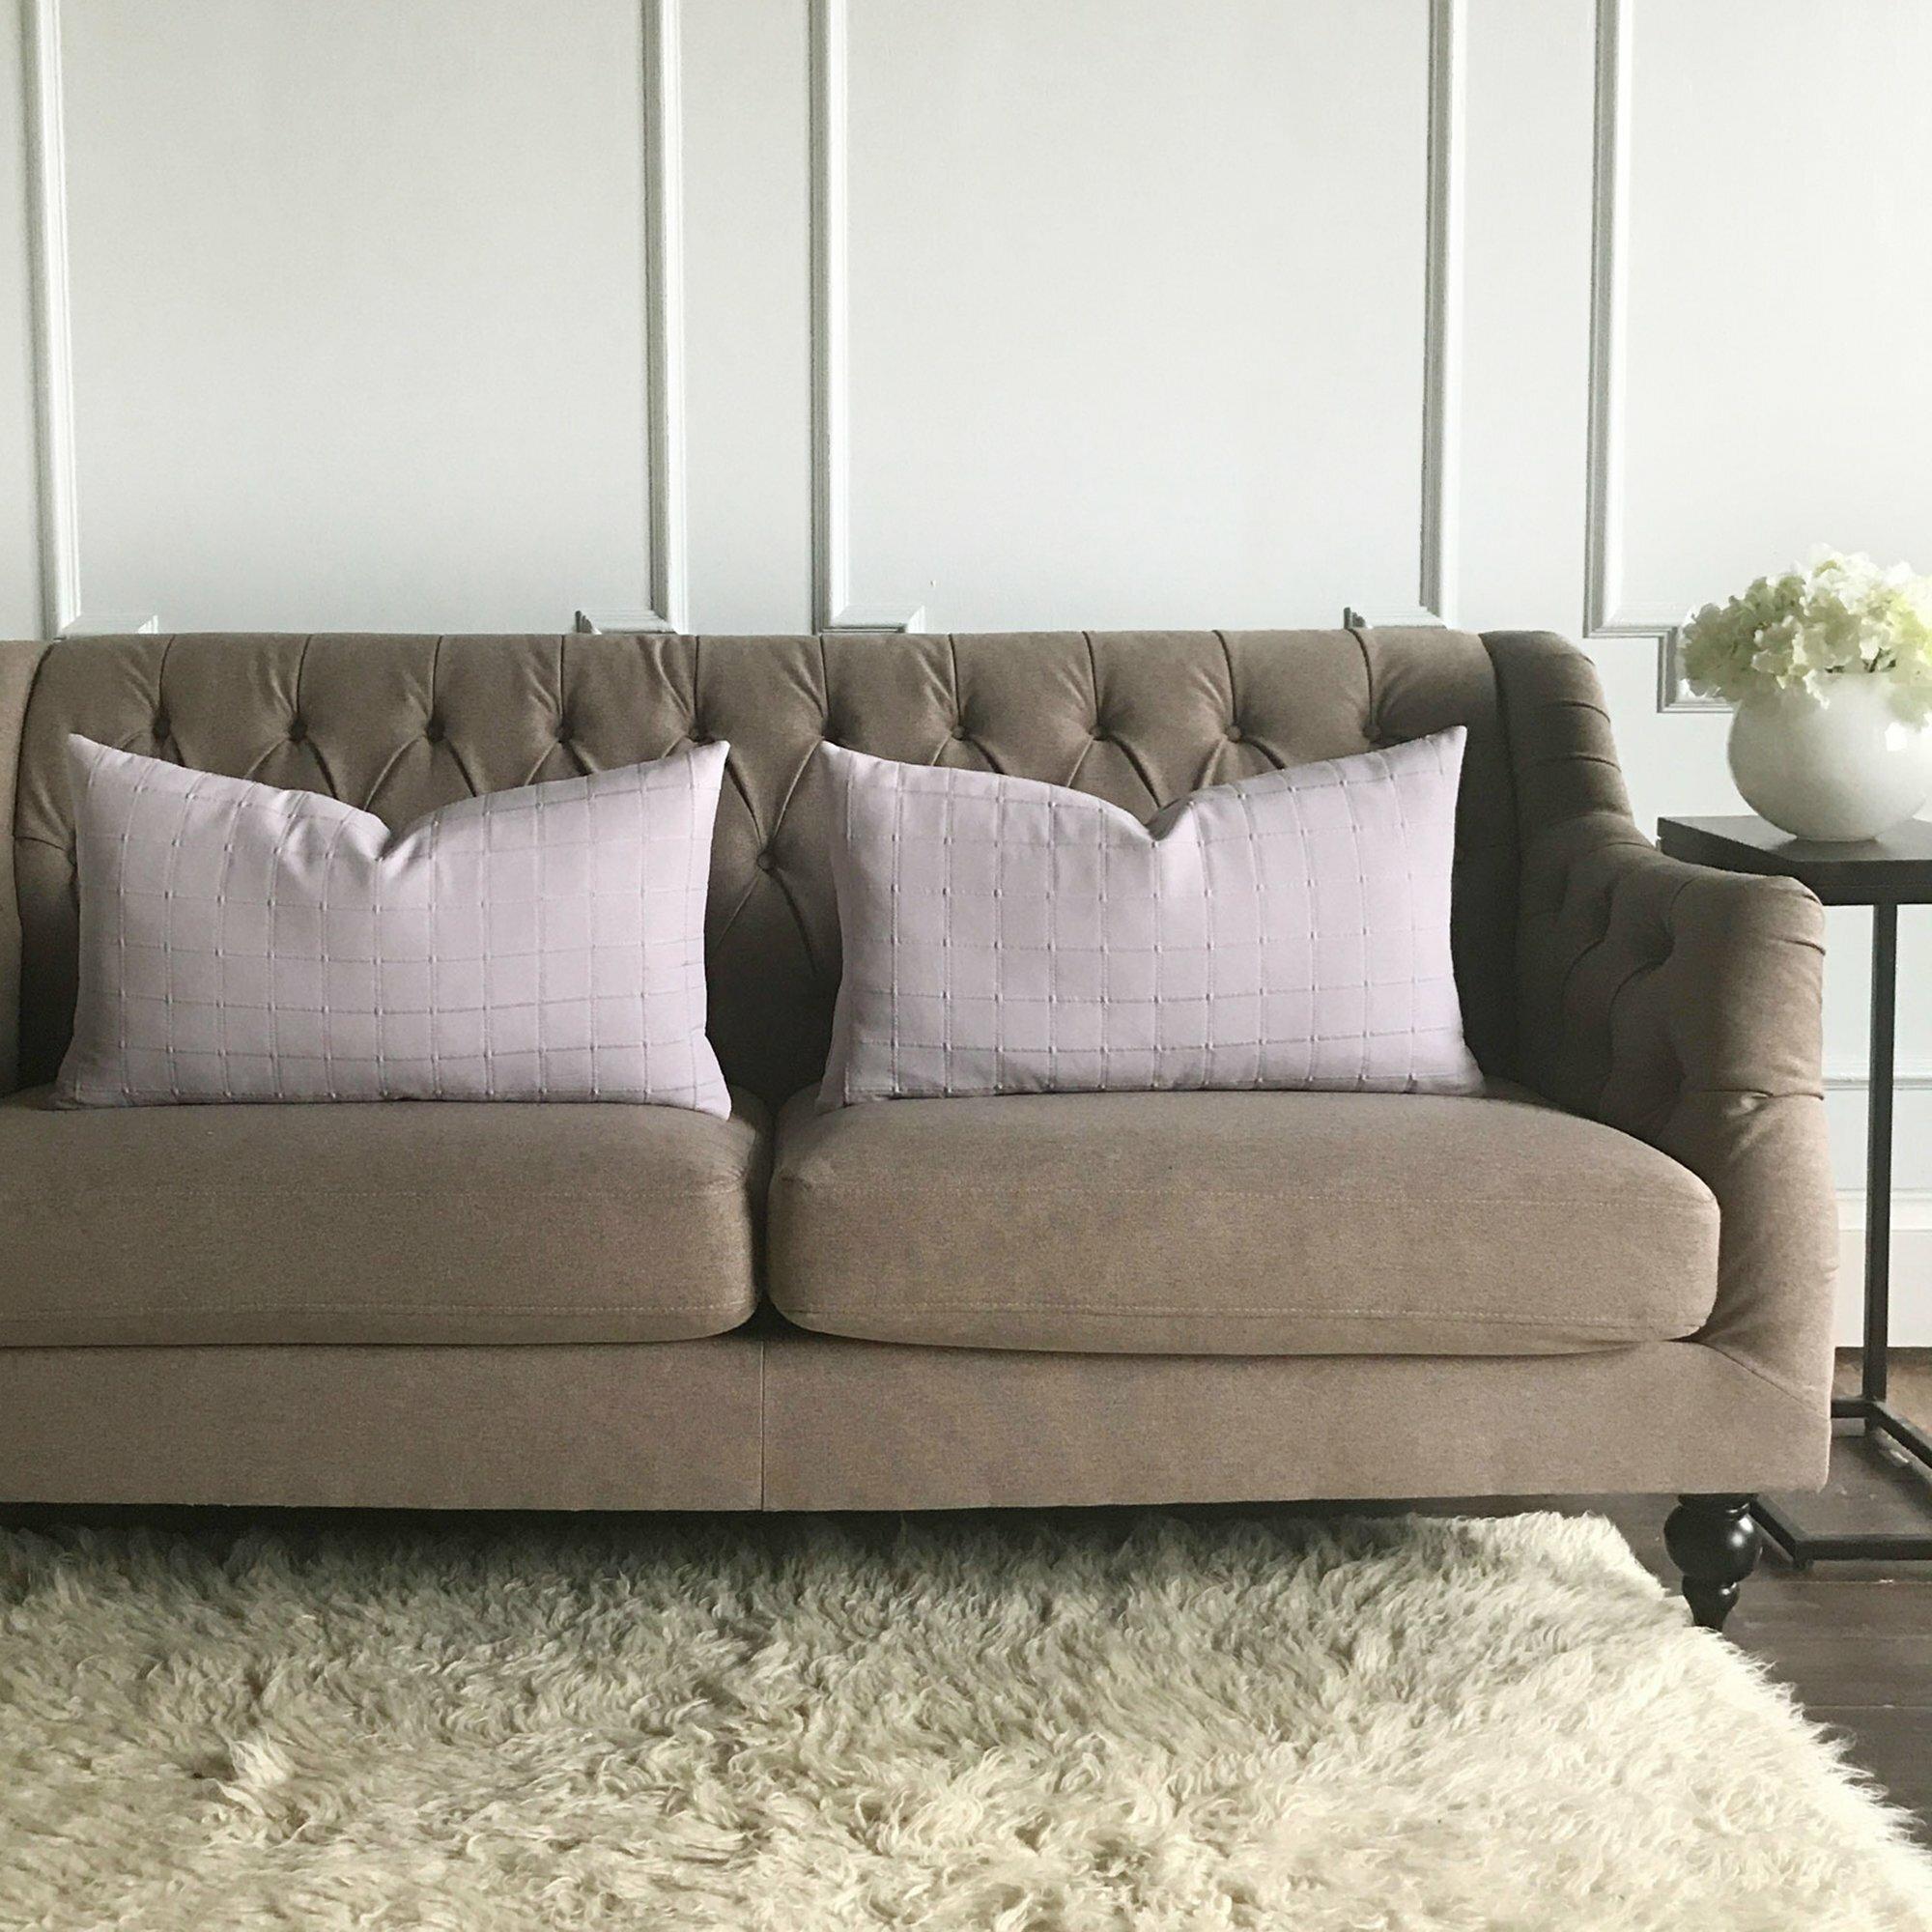 Gracie Oaks Hallman Pintuck Box Pleated Decorative Pillow Cover   Wayfair